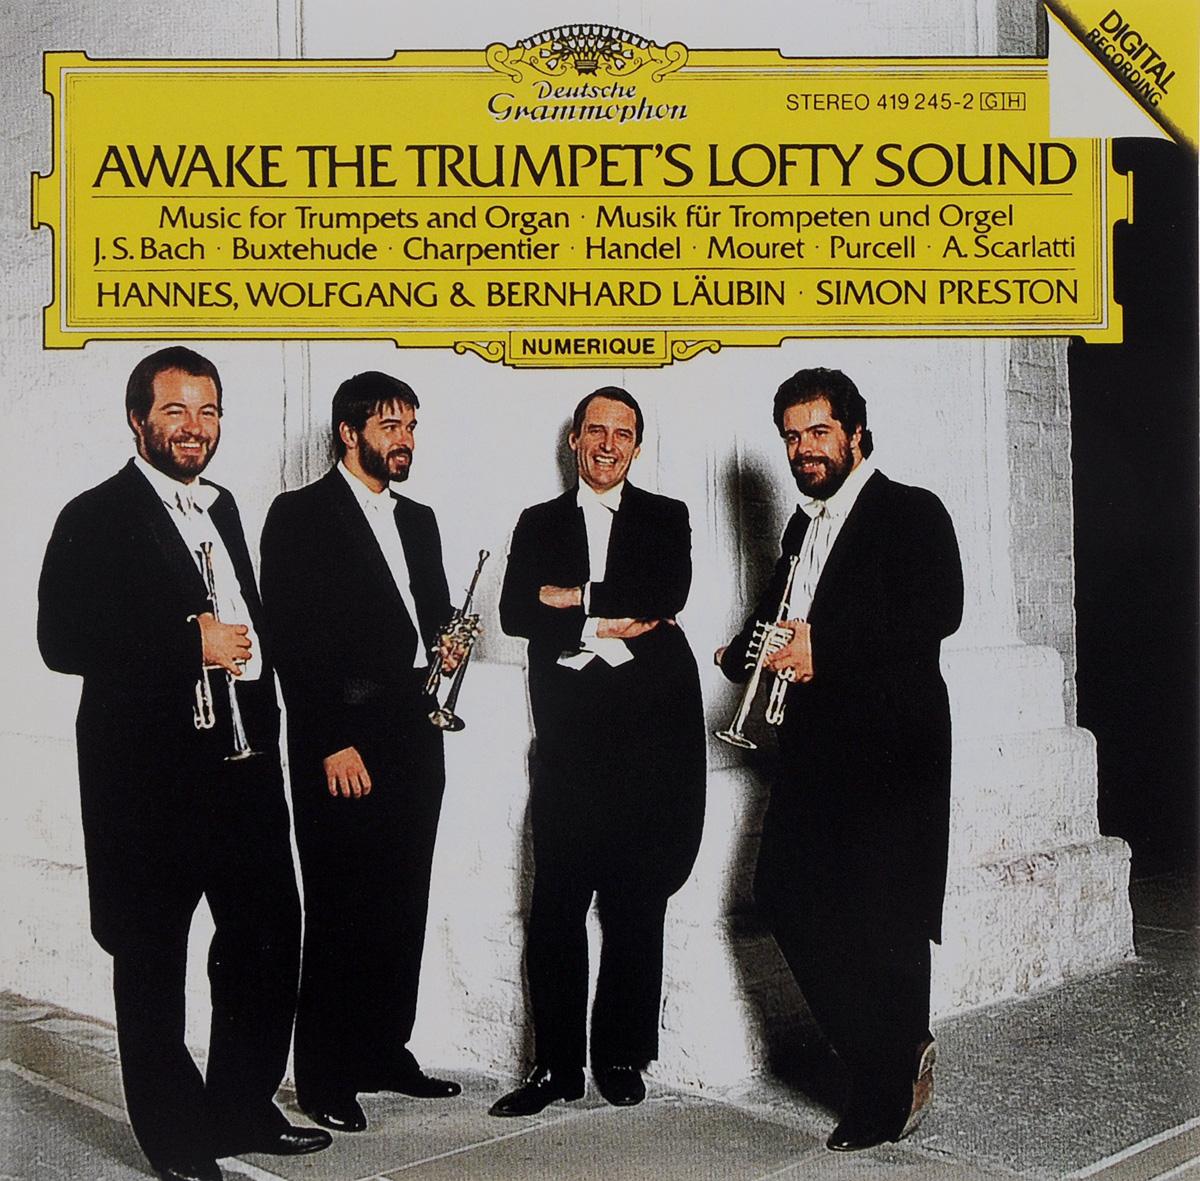 Саймон Престон,Hannes Laubin,Bernhard Laubin,Wolfgang Laubin,Norbert Schmitt Simon Preston. Awake The Trumpet's Lofty Sound